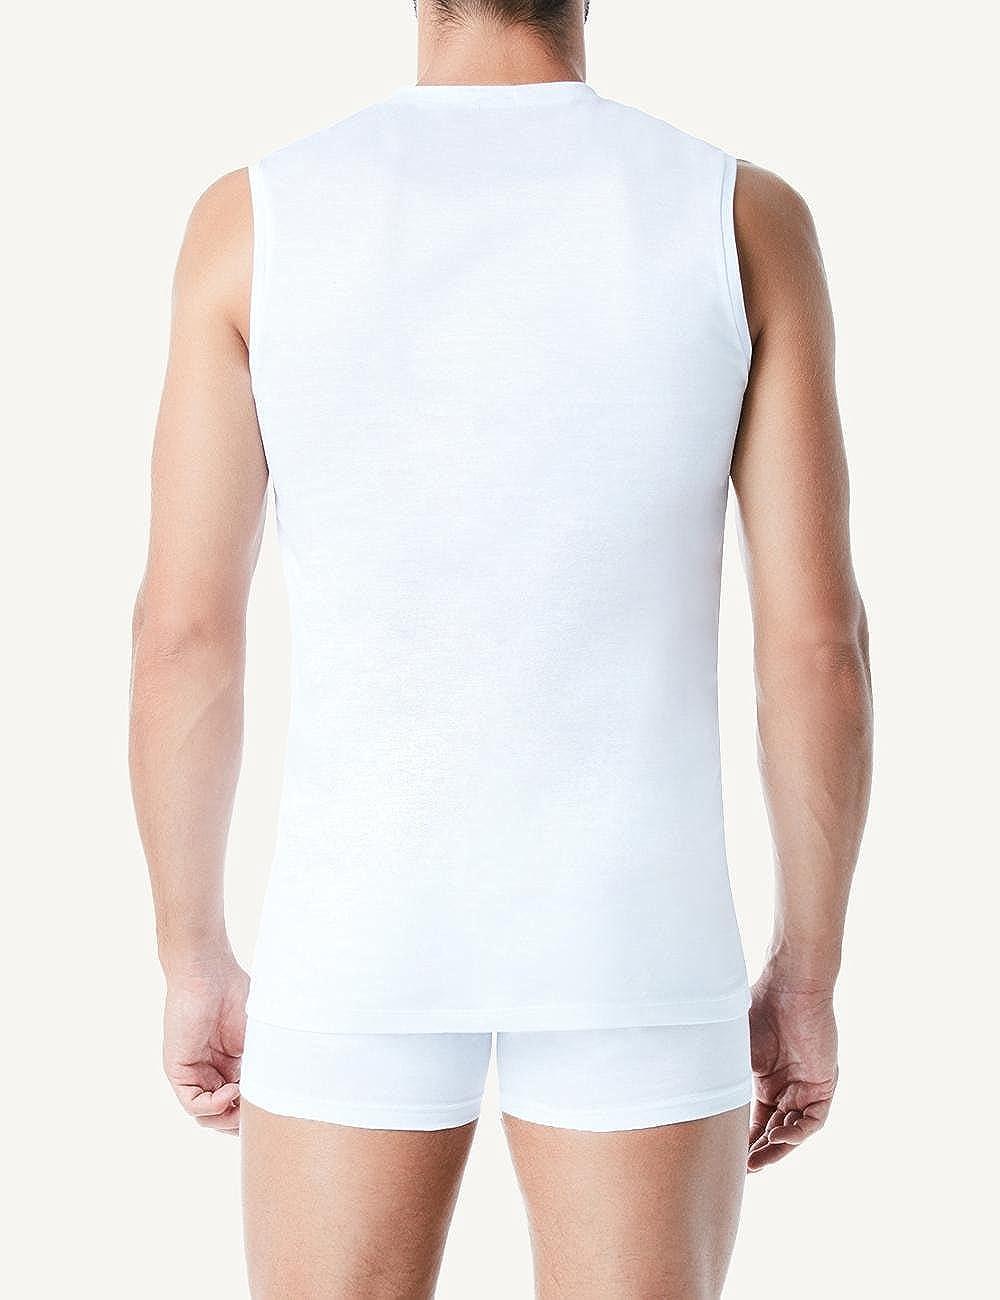 Intimissimi Mens V-Neck Egyptian Cotton Sleeveless Top